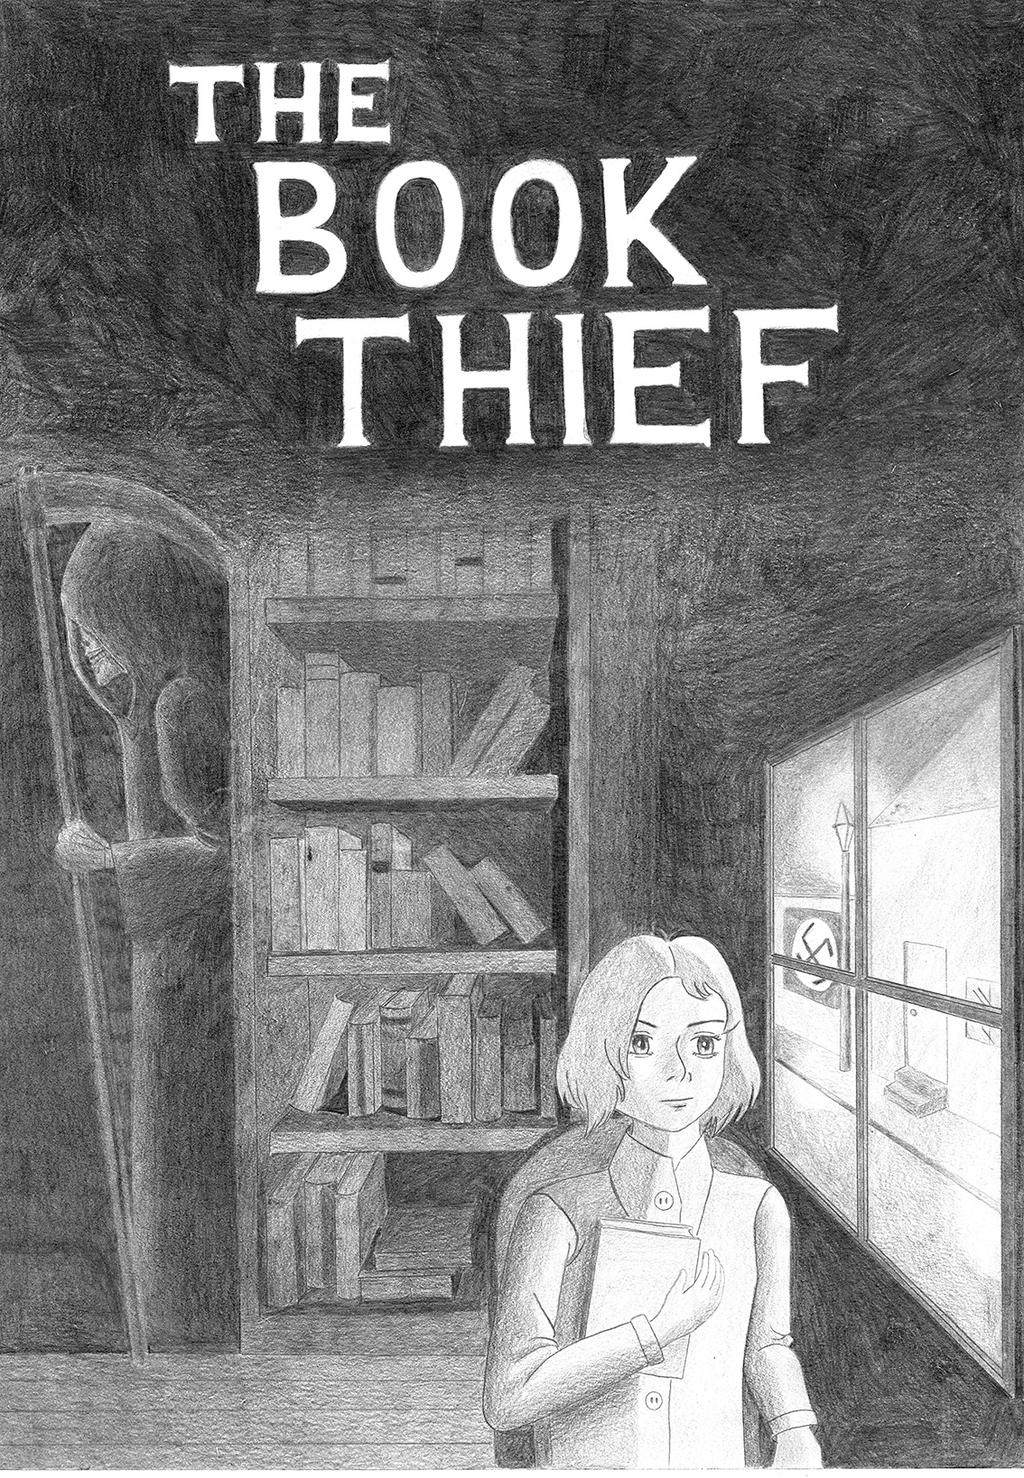 Book Thief Cover Art : The book thief cover by denakitan on deviantart